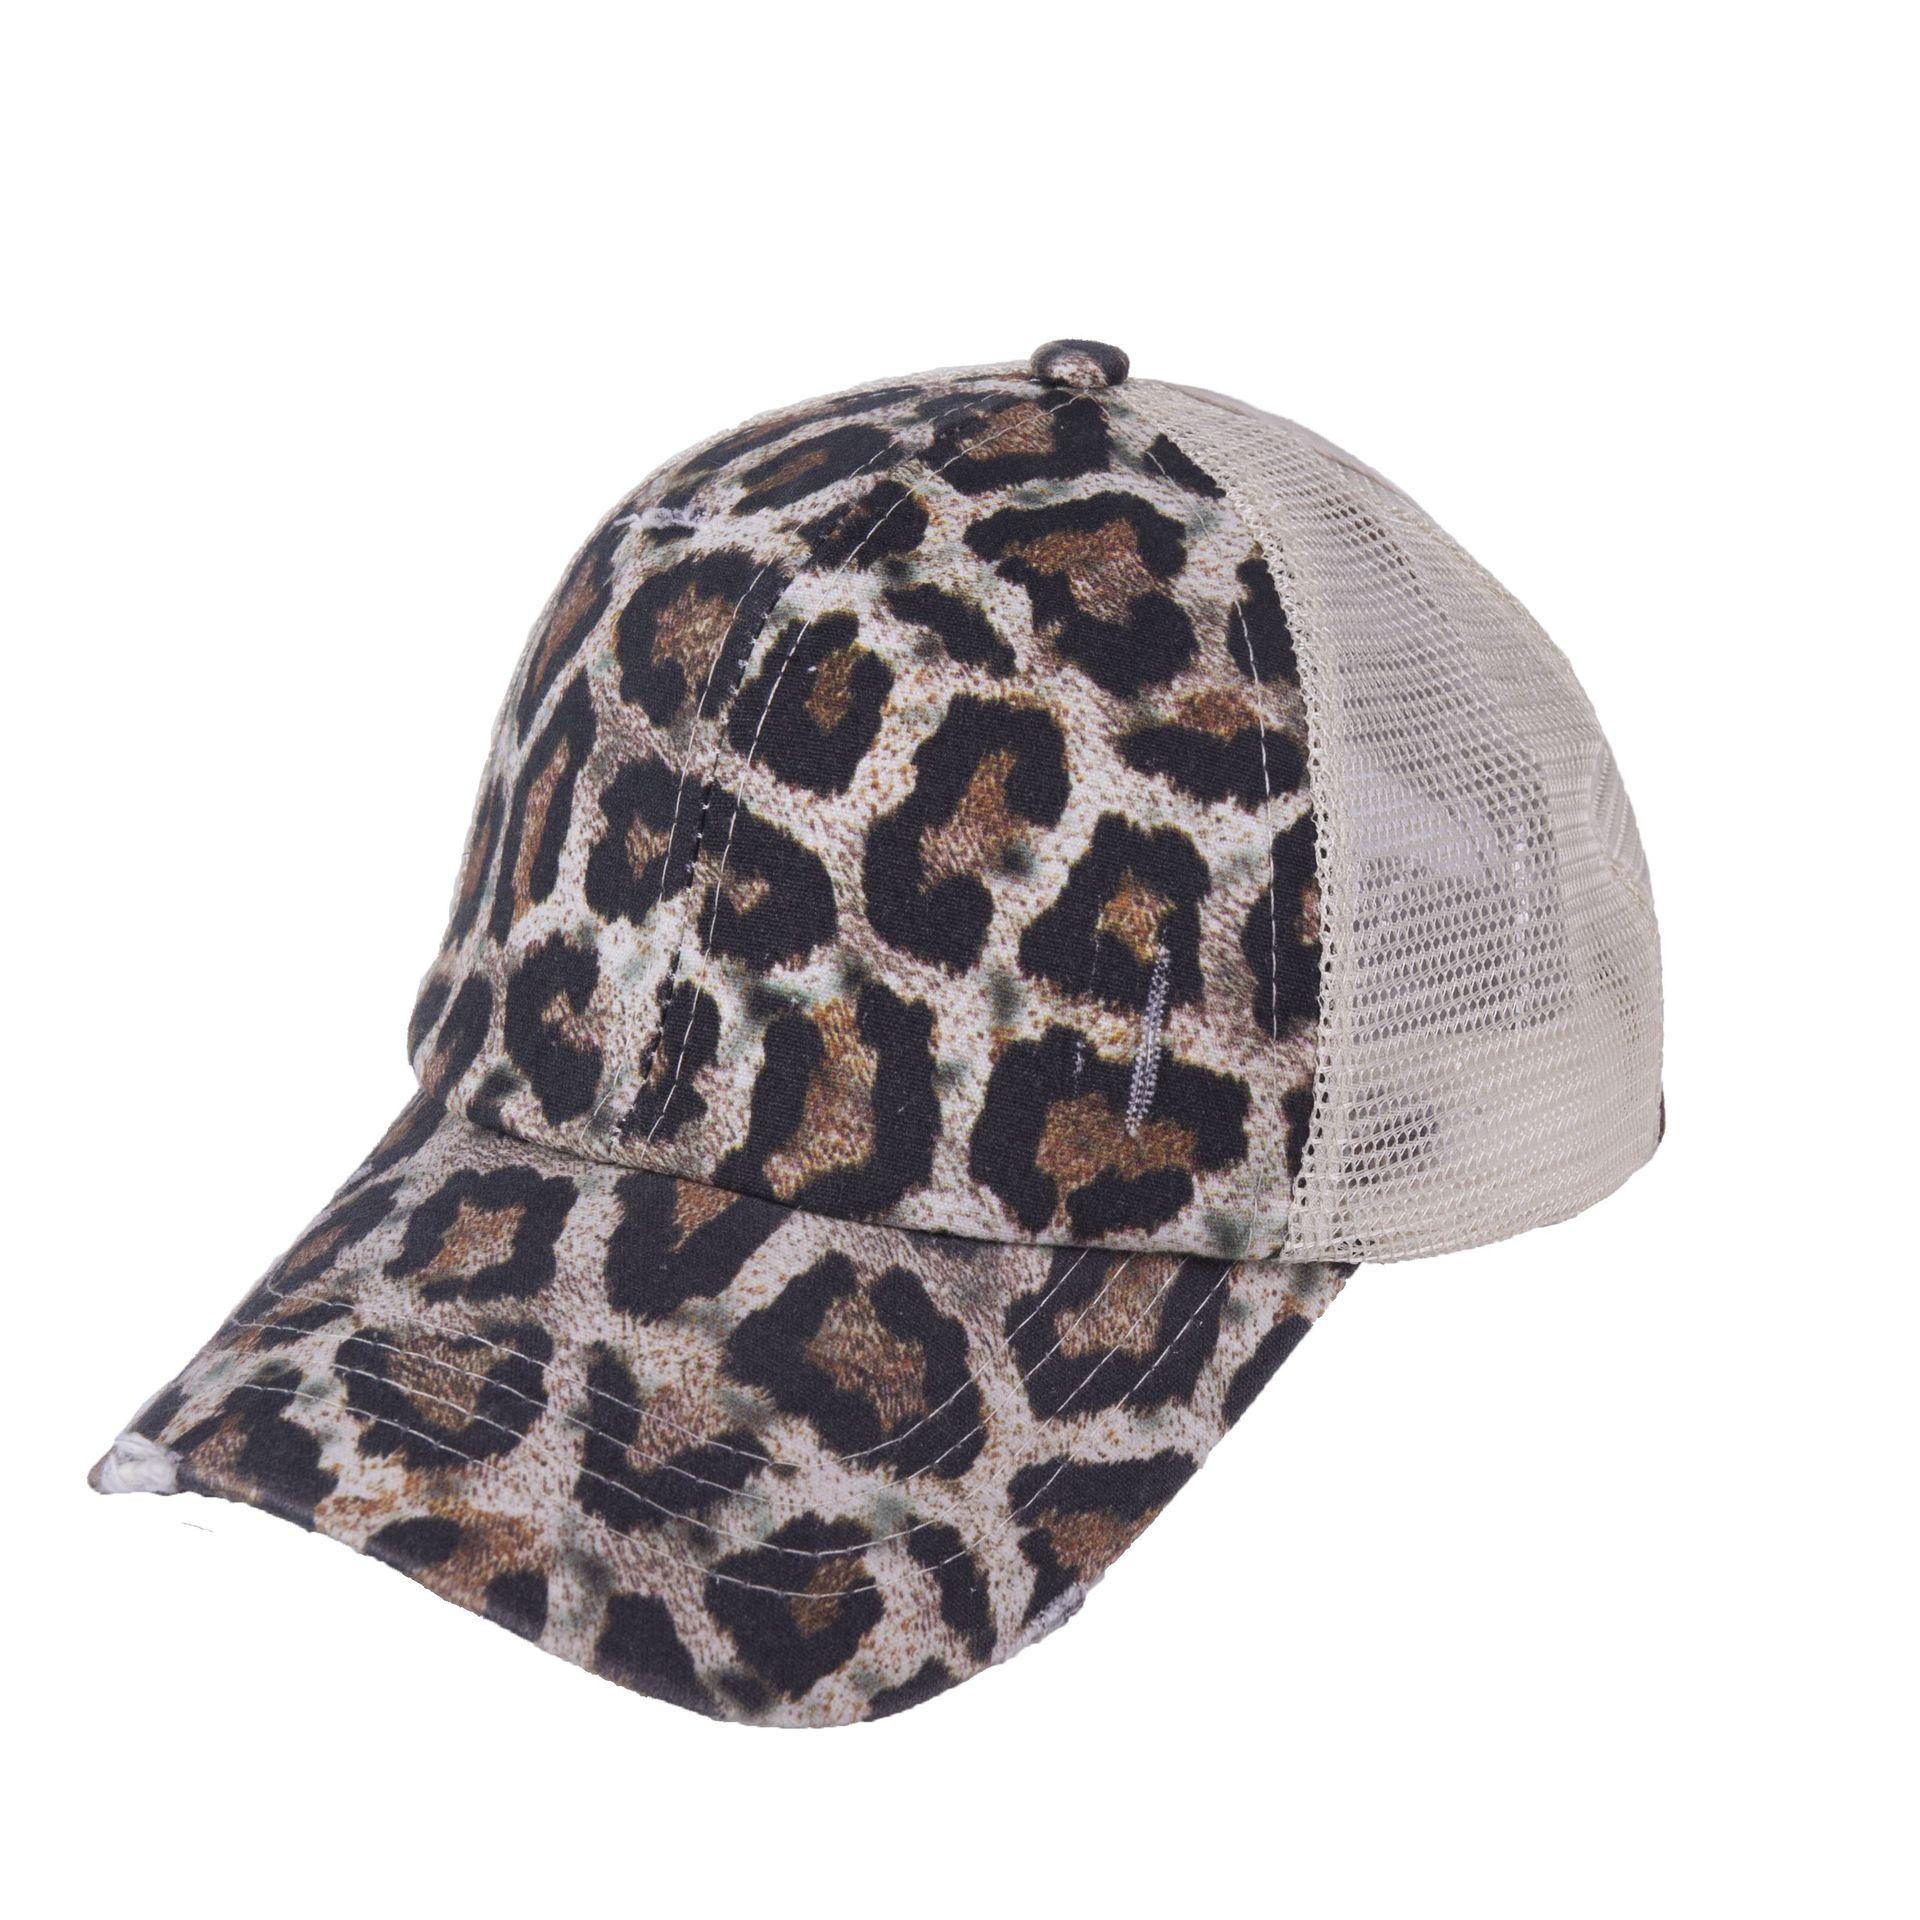 5pcs Sample Leopard Torn Mesh Hat With Adjustable Buckle Camo Sun Hat Mesh Summer Hat DOM1061618